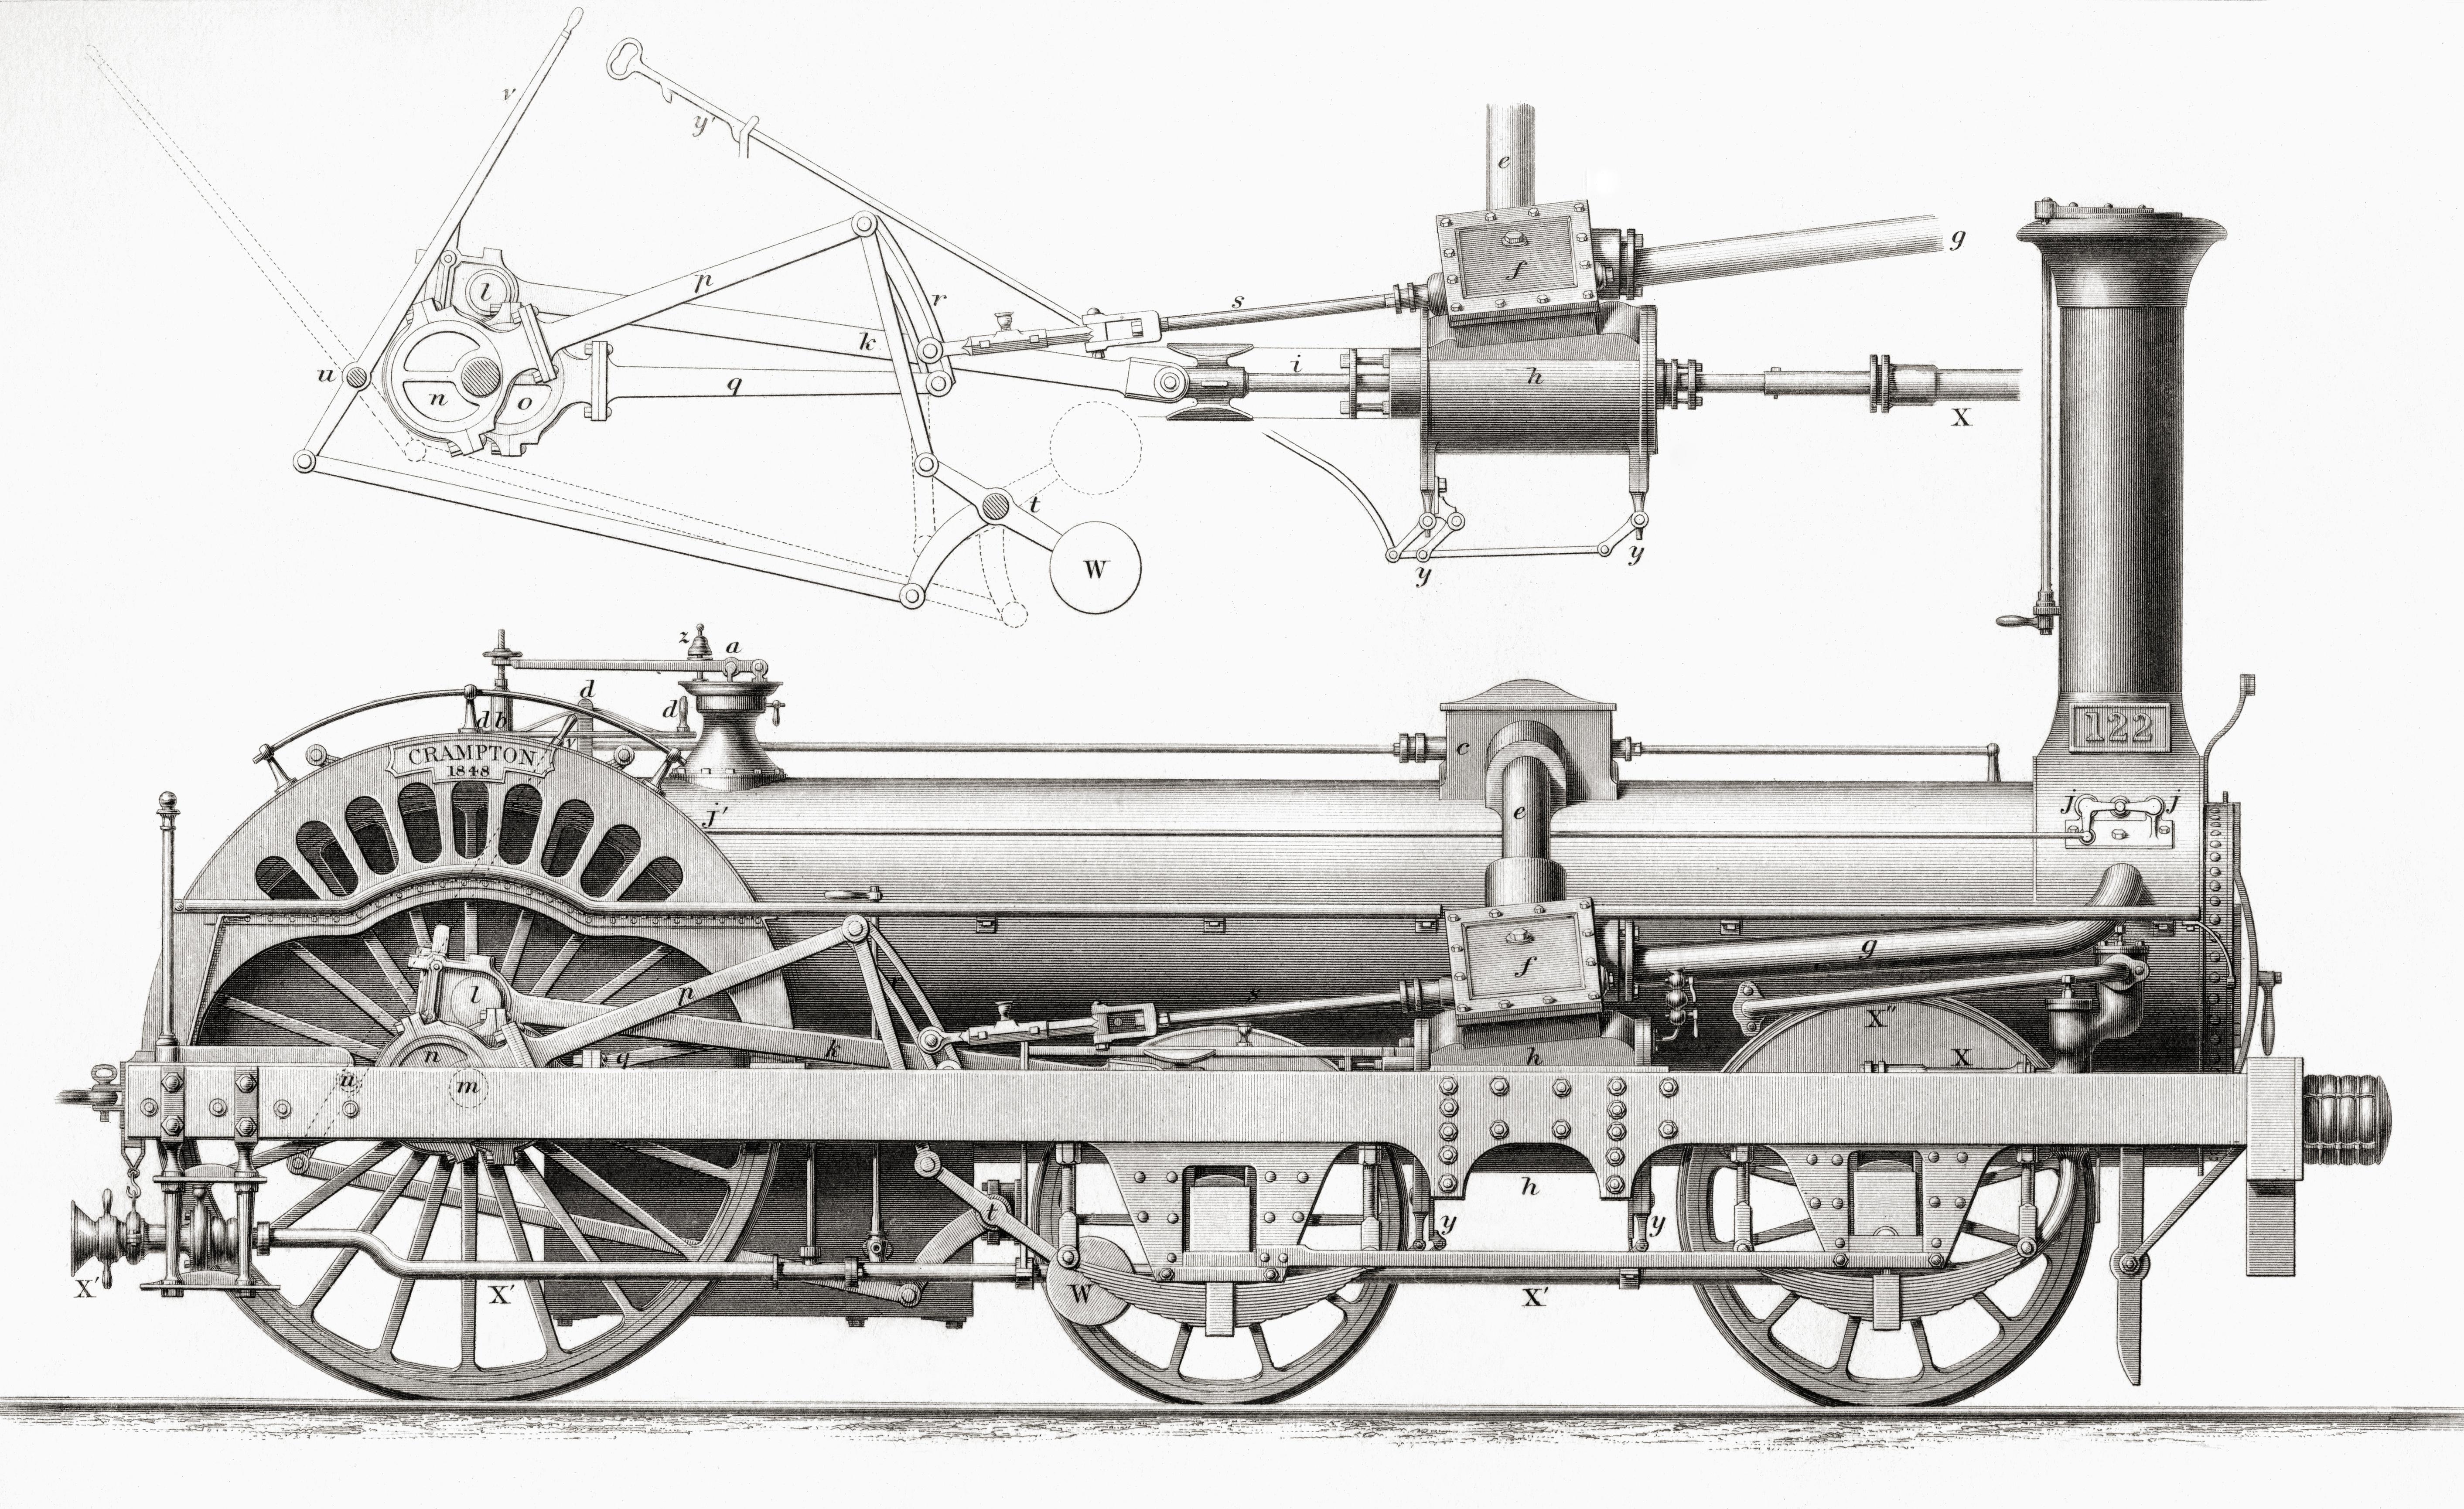 Crampton's Railway Steam Locomotive Engine